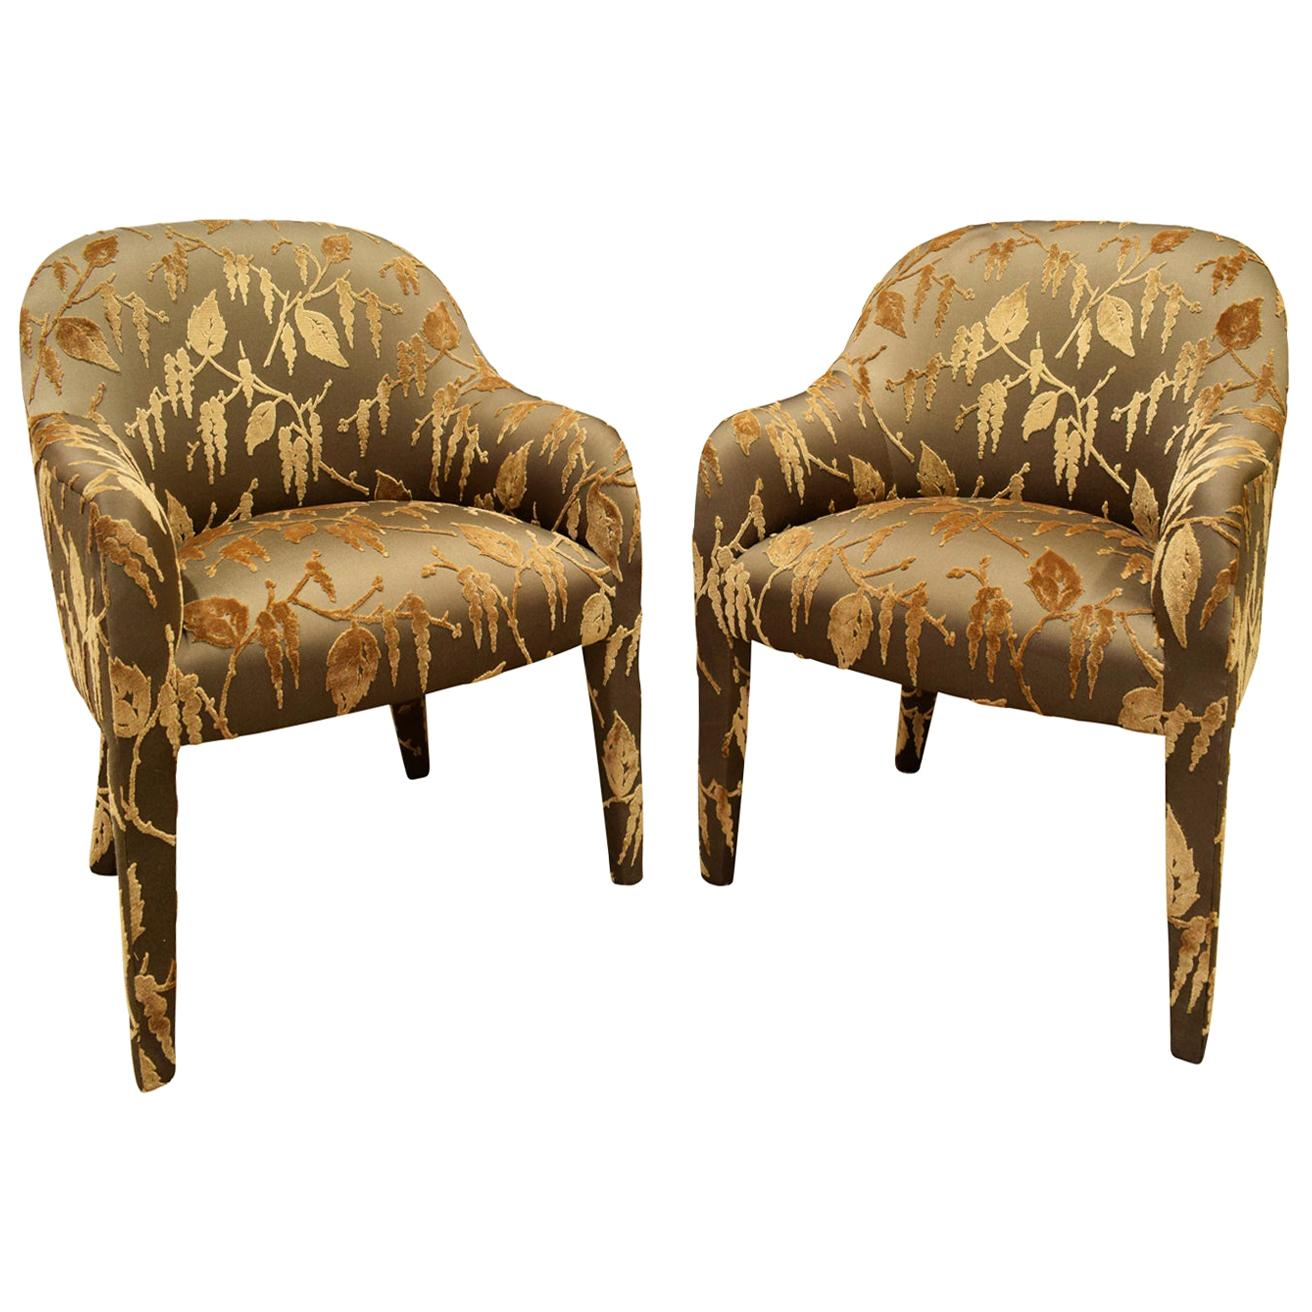 "Karl Springer Pair of ""Upholstered Chairs"", 1980s"